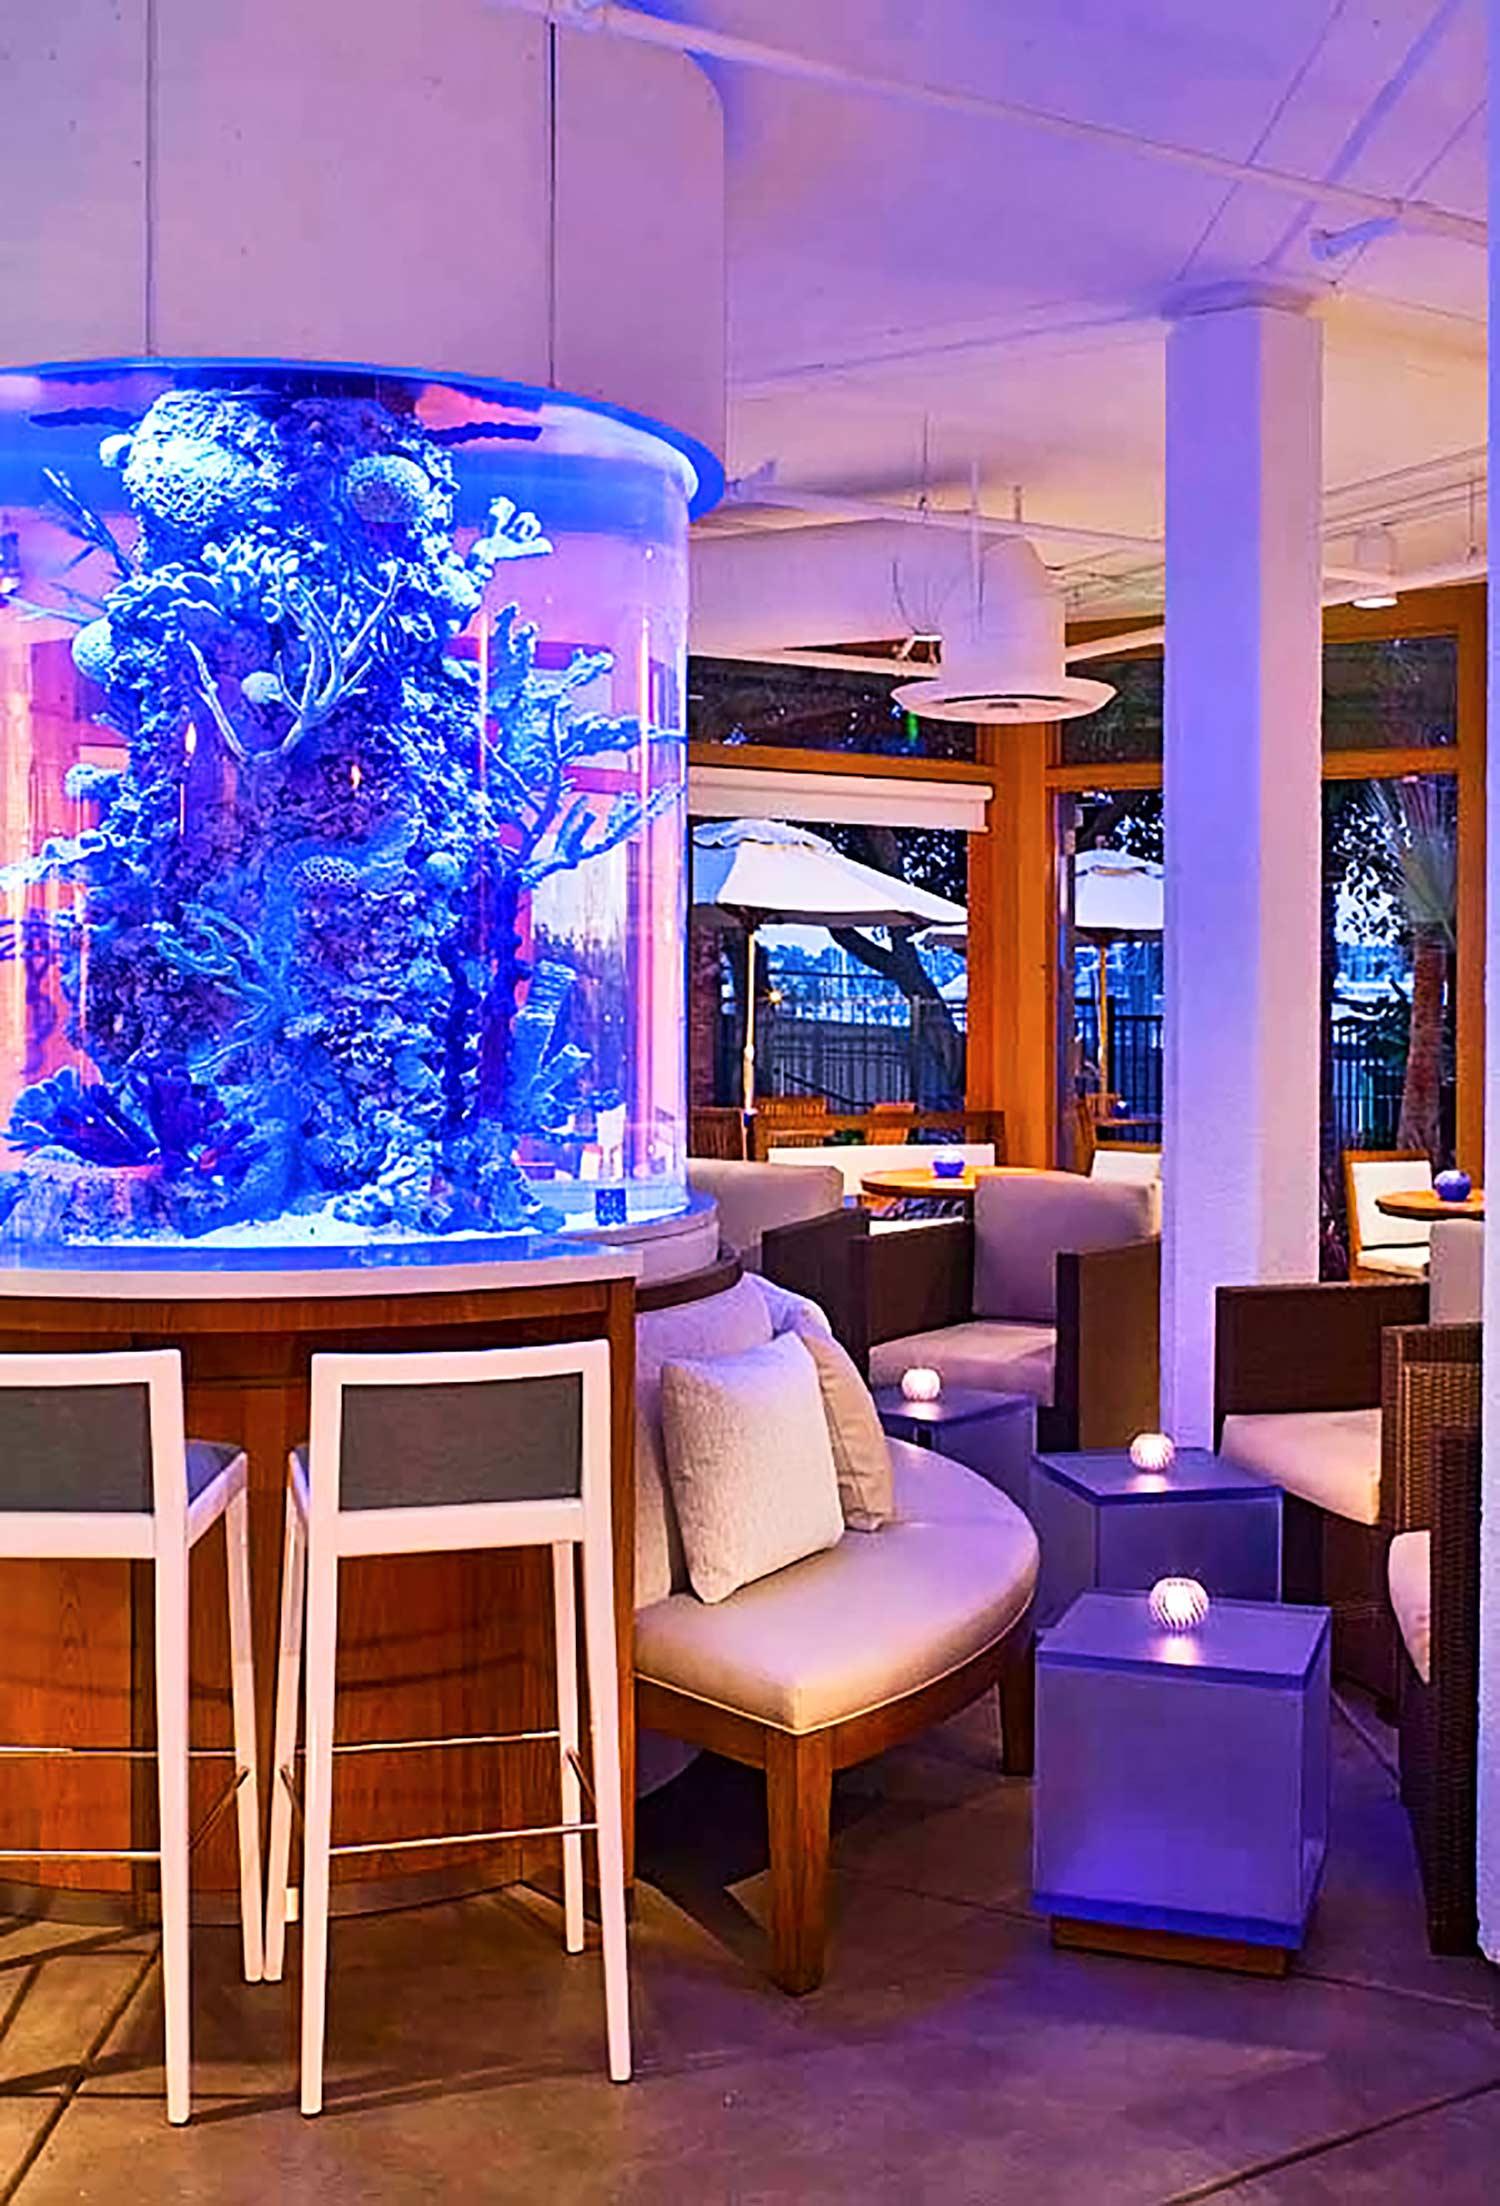 Aquariuam feature at Hyatt Regency Mission Bay